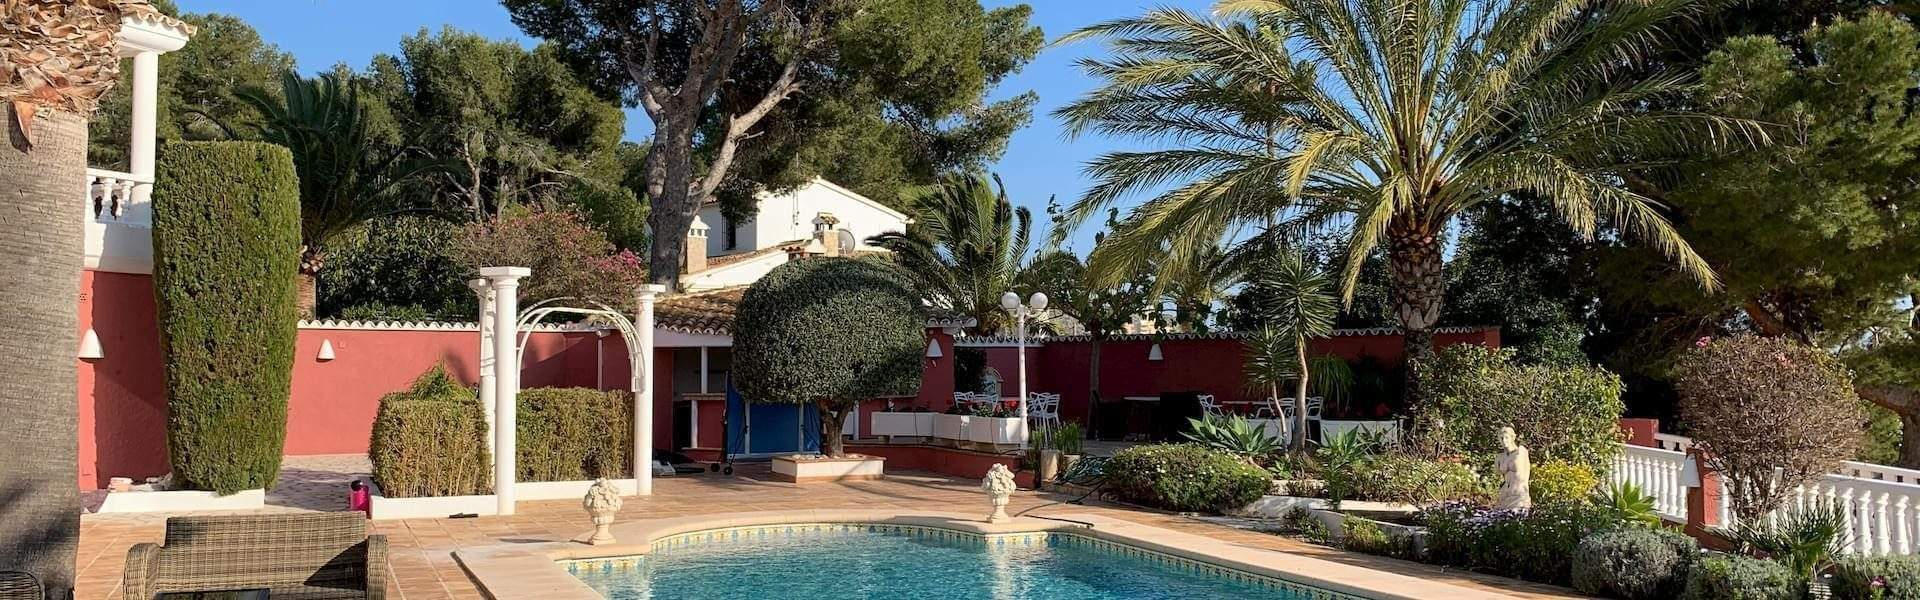 Villa Camino de la Paz is located in a wonderful location in Spain